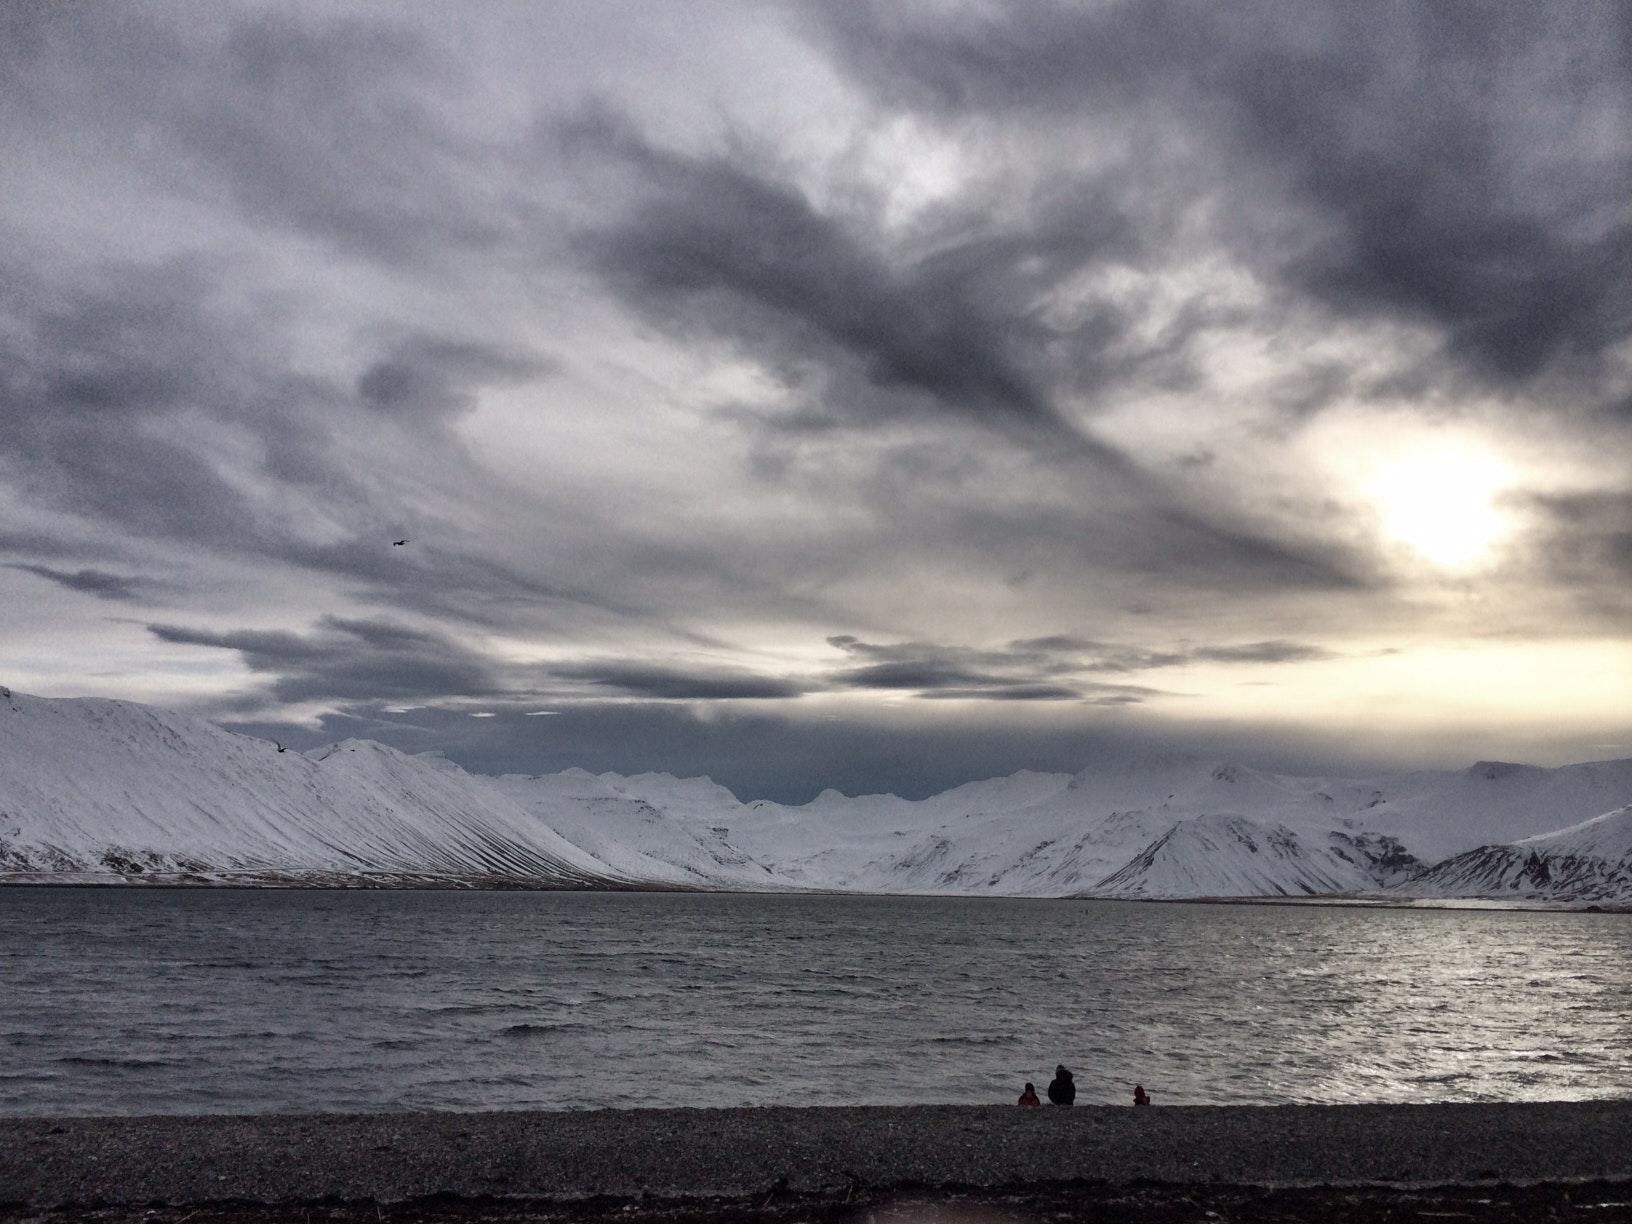 Kolgrafarfjörður on the north side of Snæfellsnes peninsula